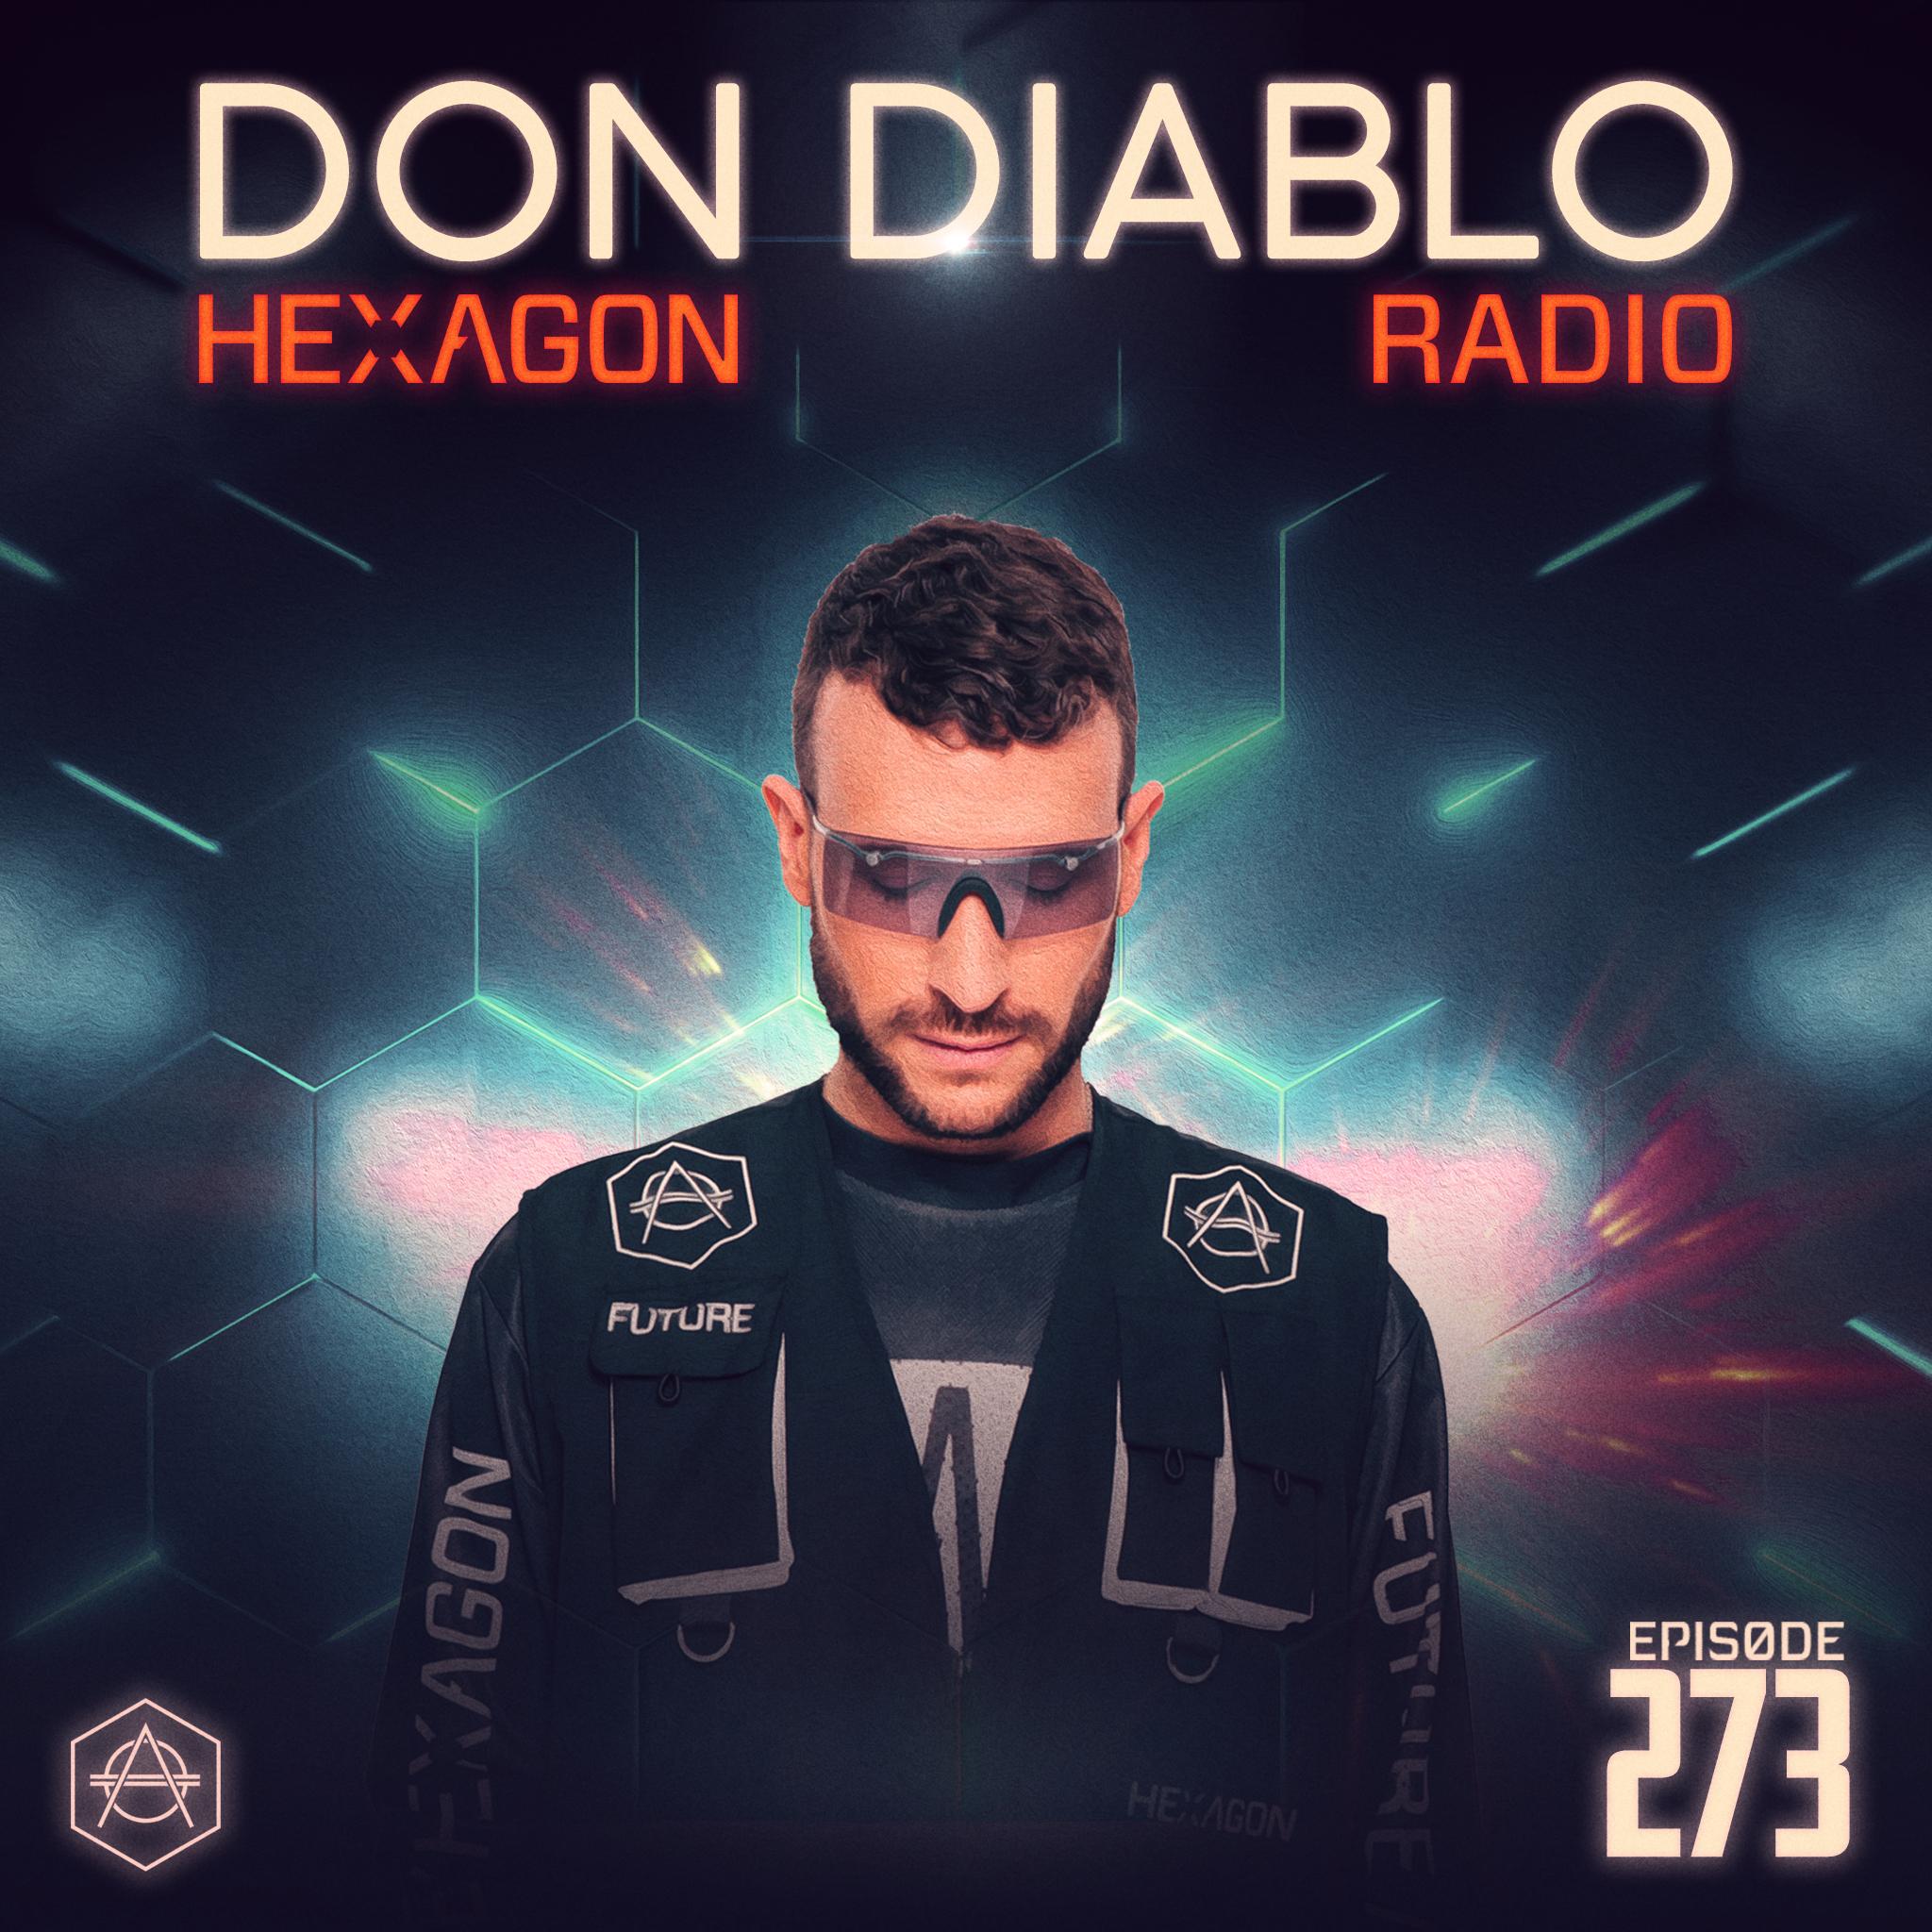 Don Diablo Hexagon Radio Episode 273